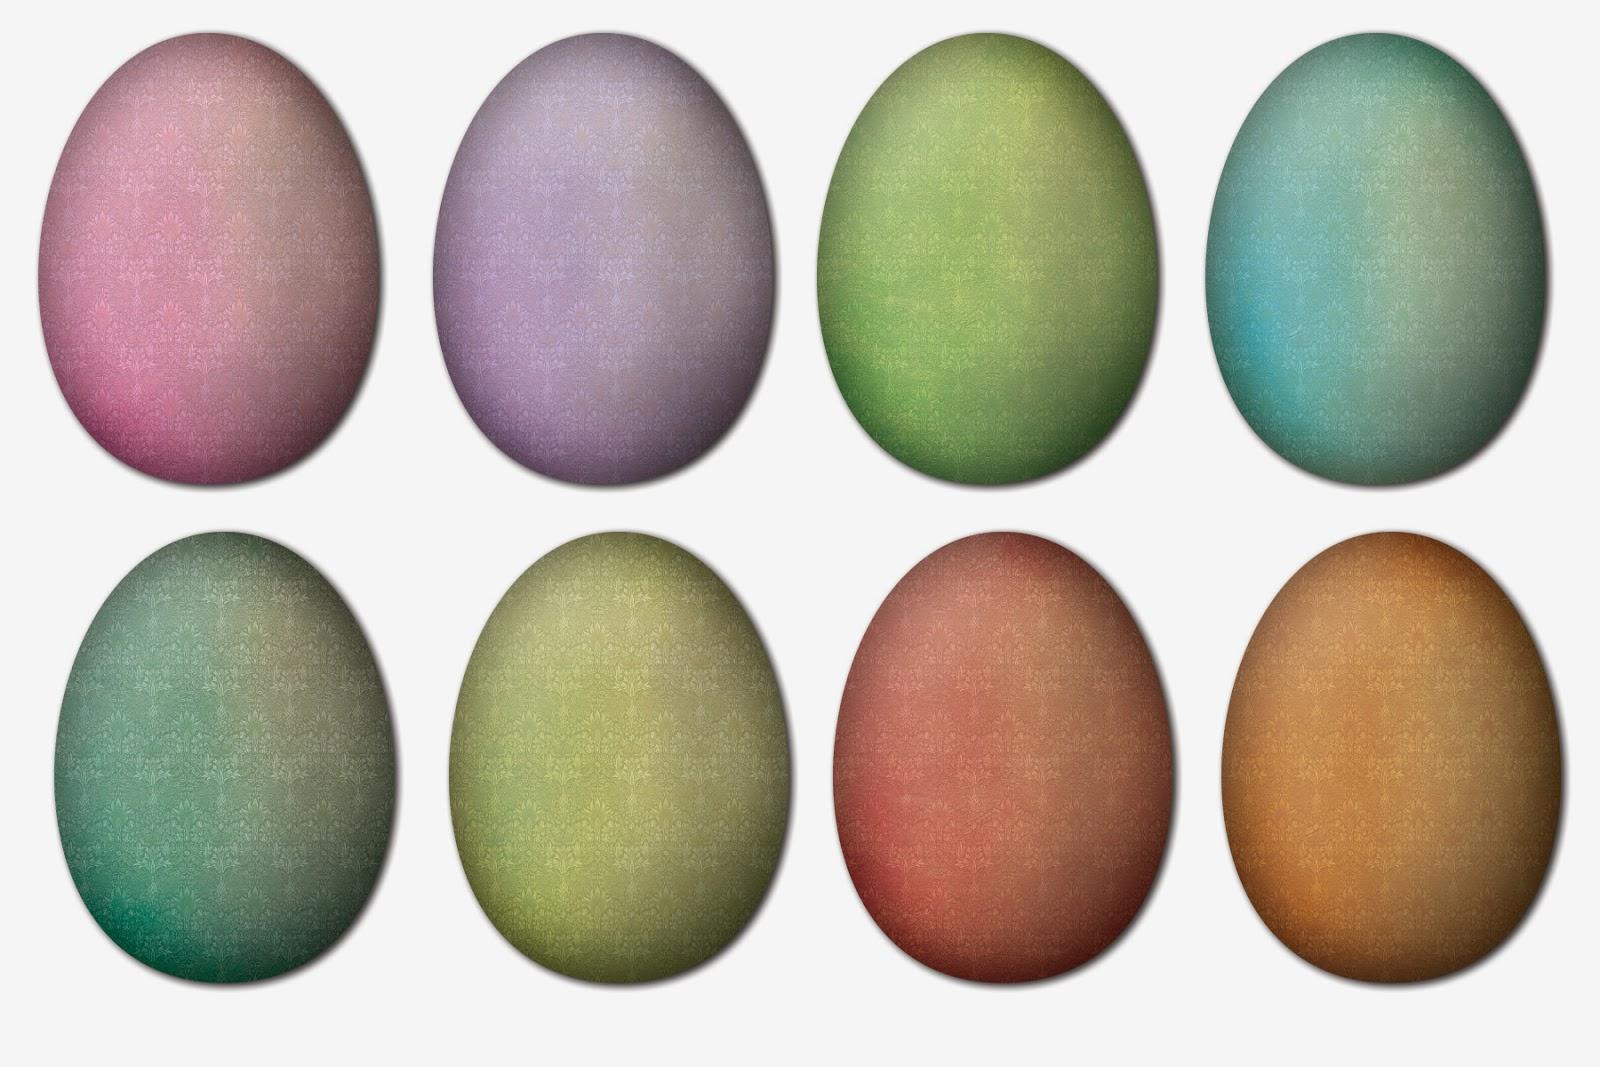 free easter egg images